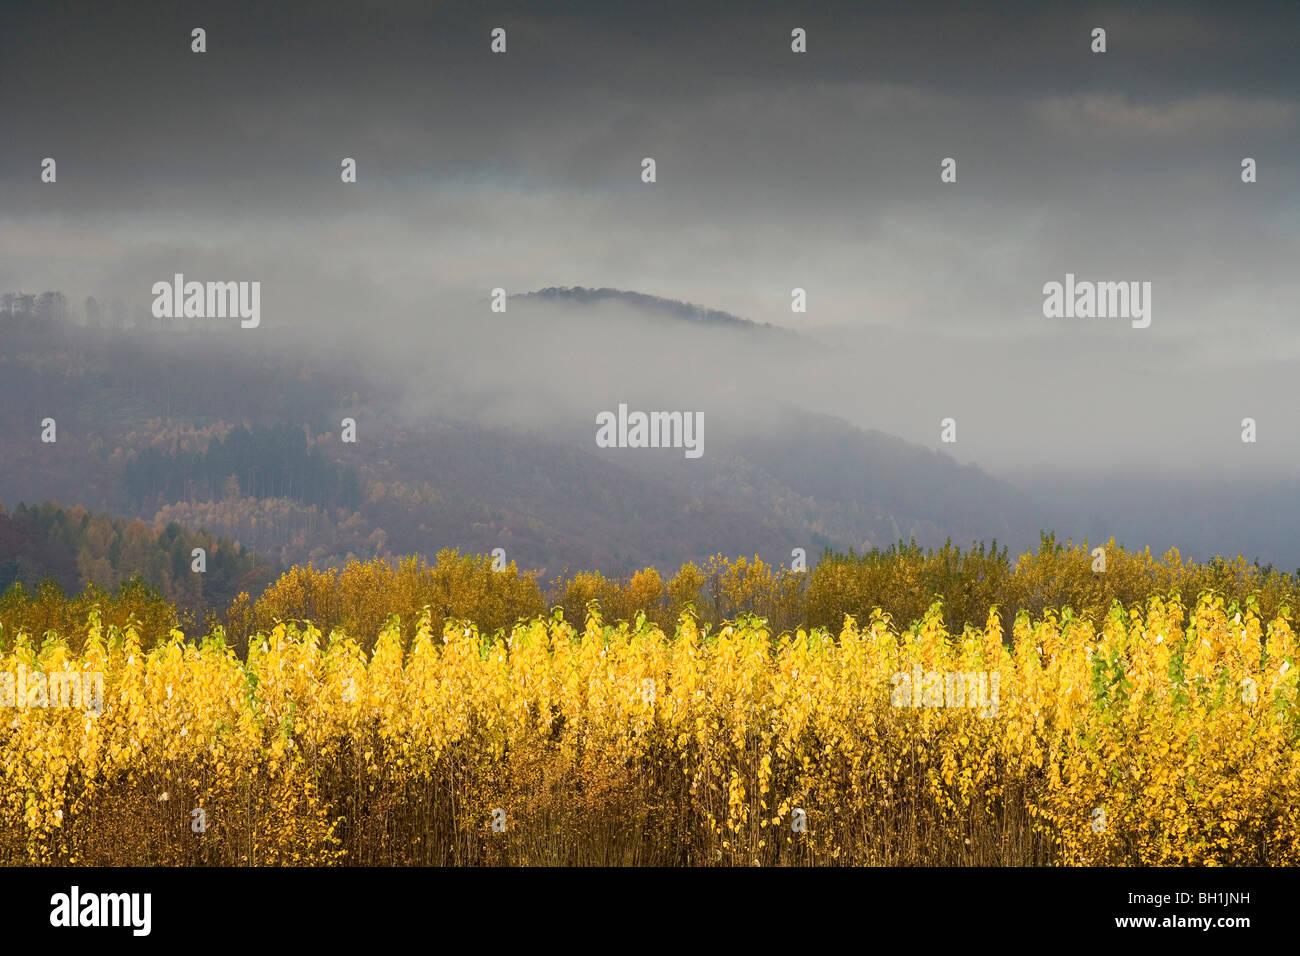 Autumnal landscape in the fog, Weserbergland, Lower Saxony, Germany, Europe - Stock Image